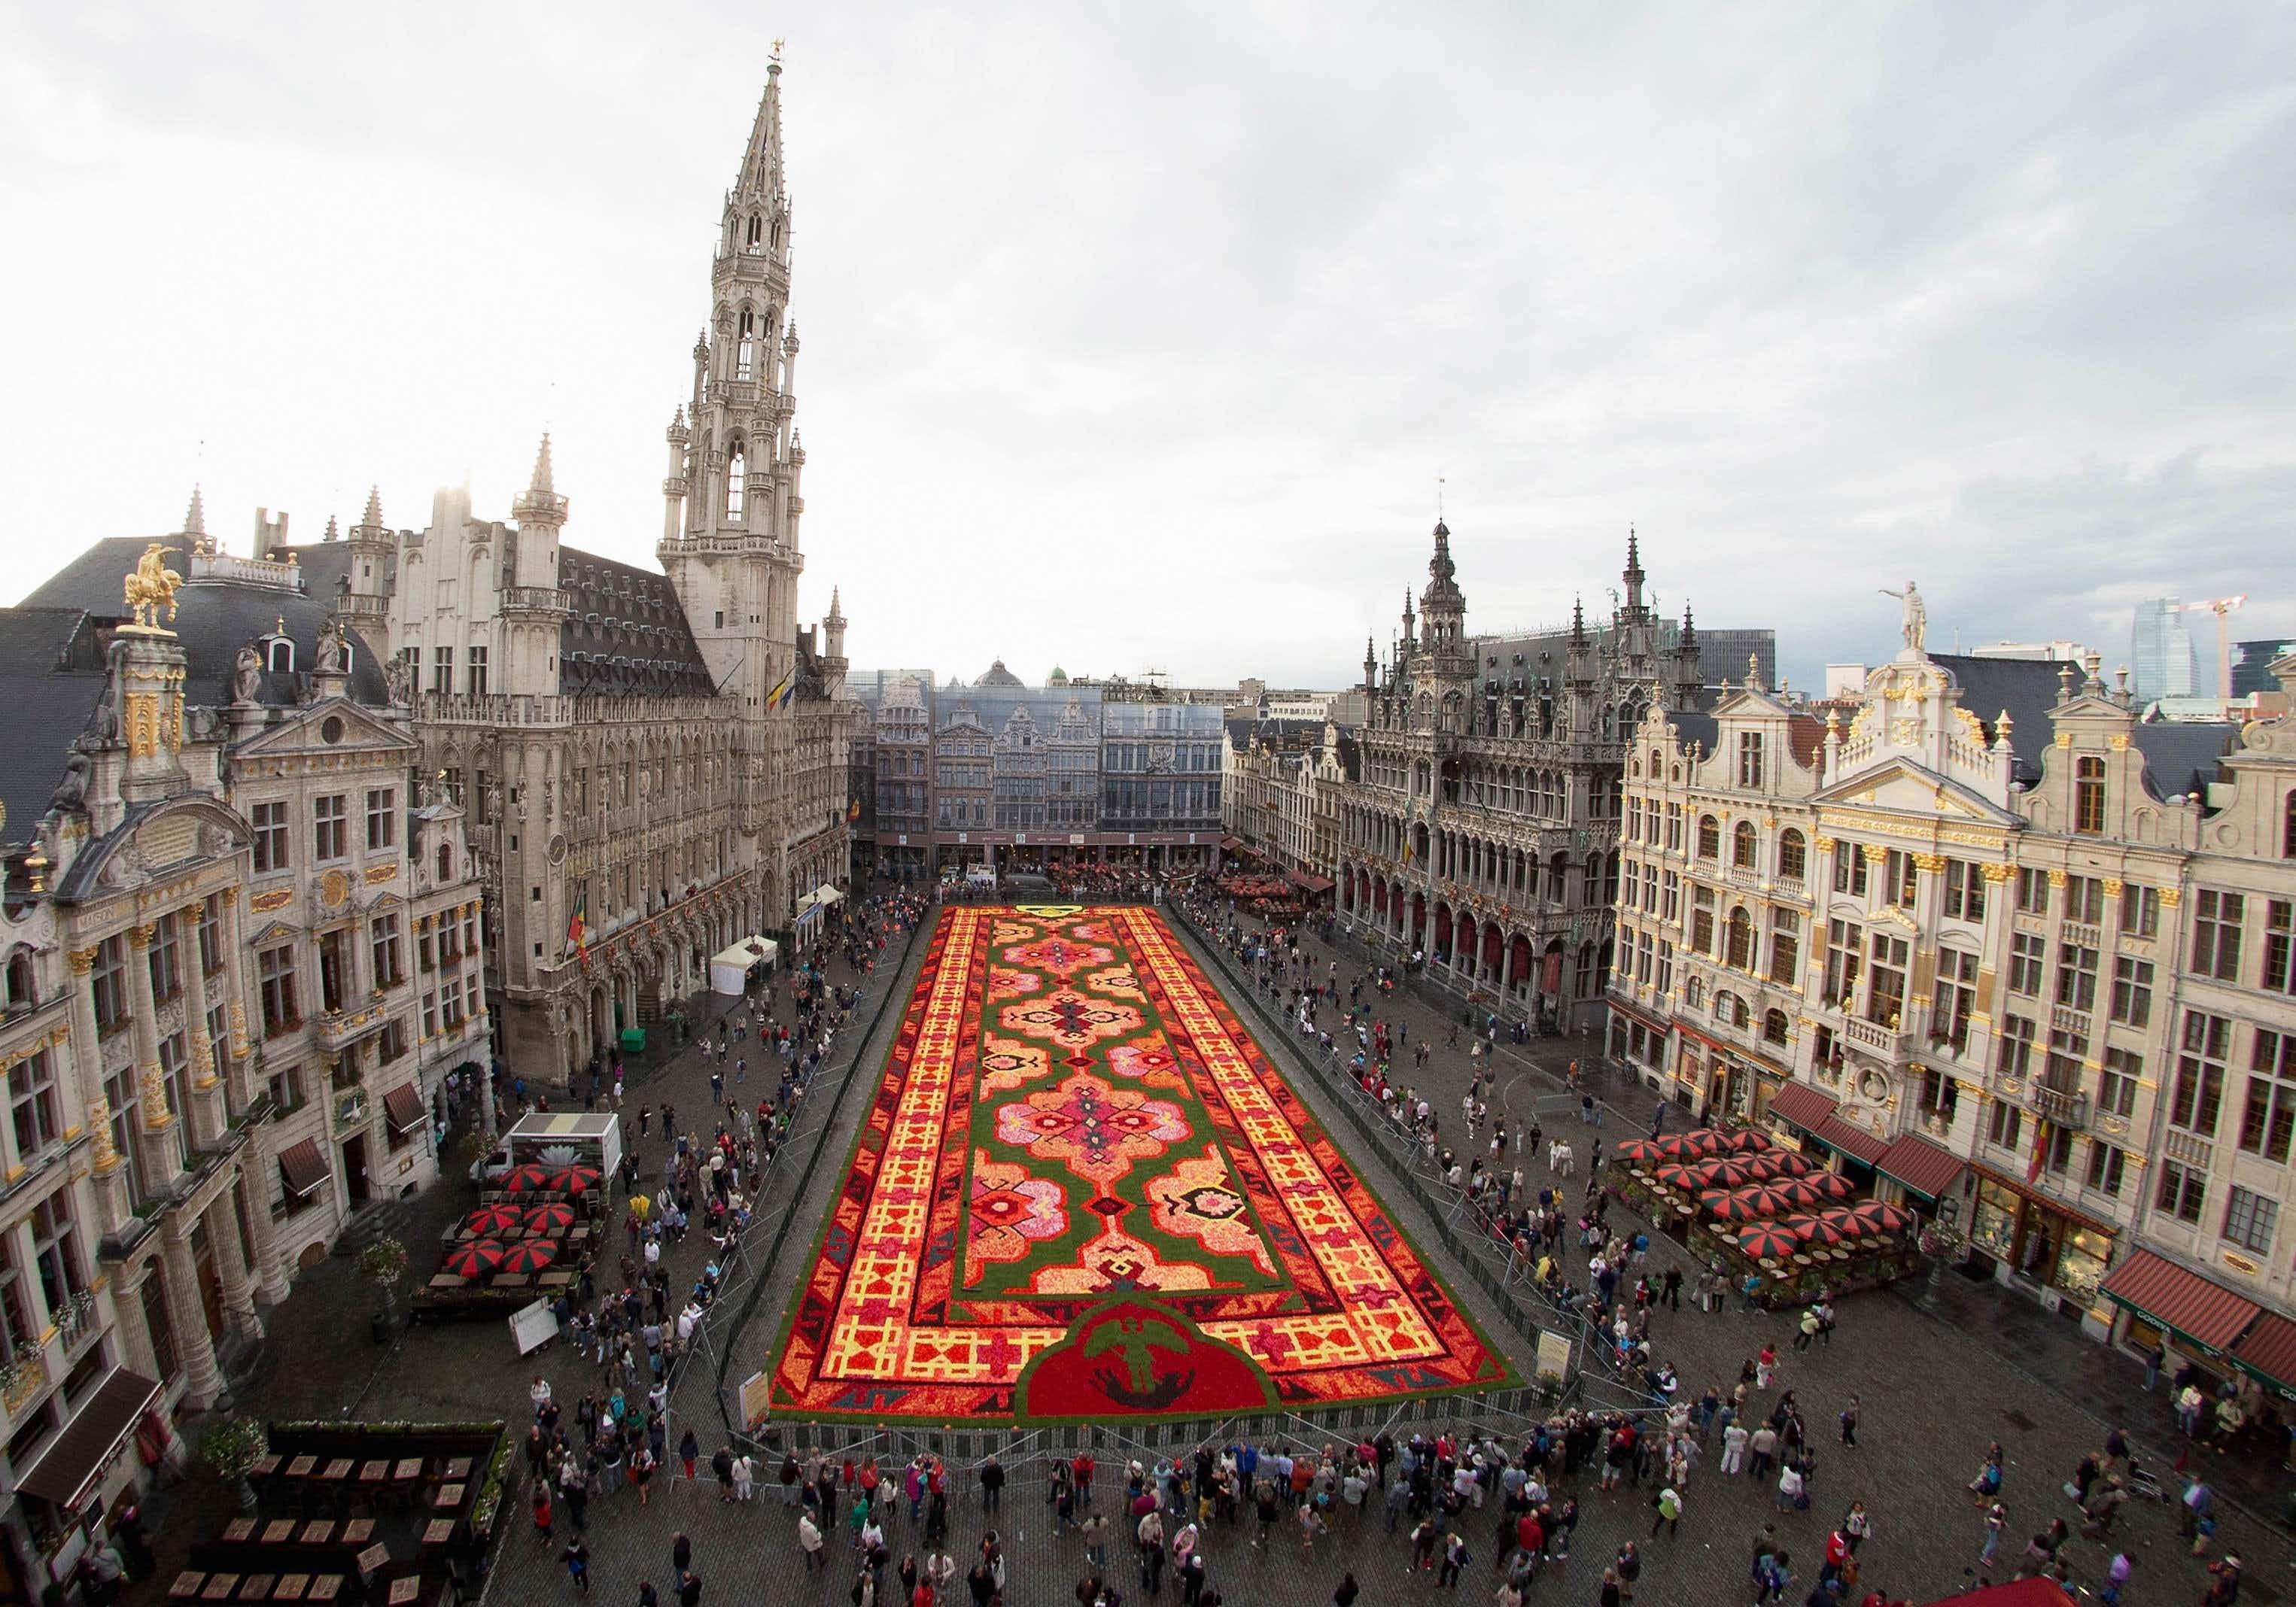 Brussels' magical Flower Carpet returns this weekend